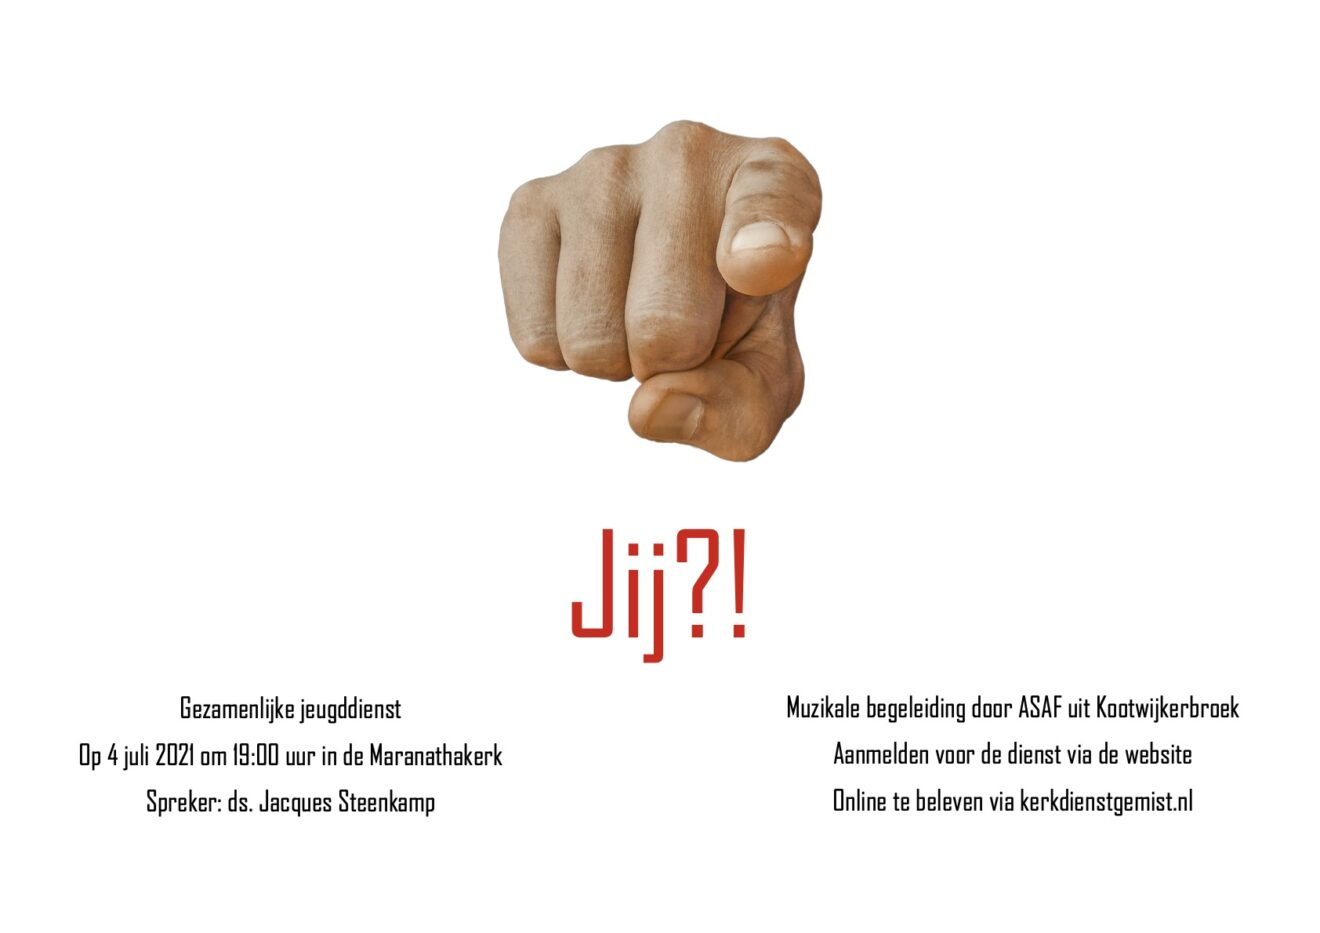 Poster jeugddienst 4 juli 2021 (2.1)